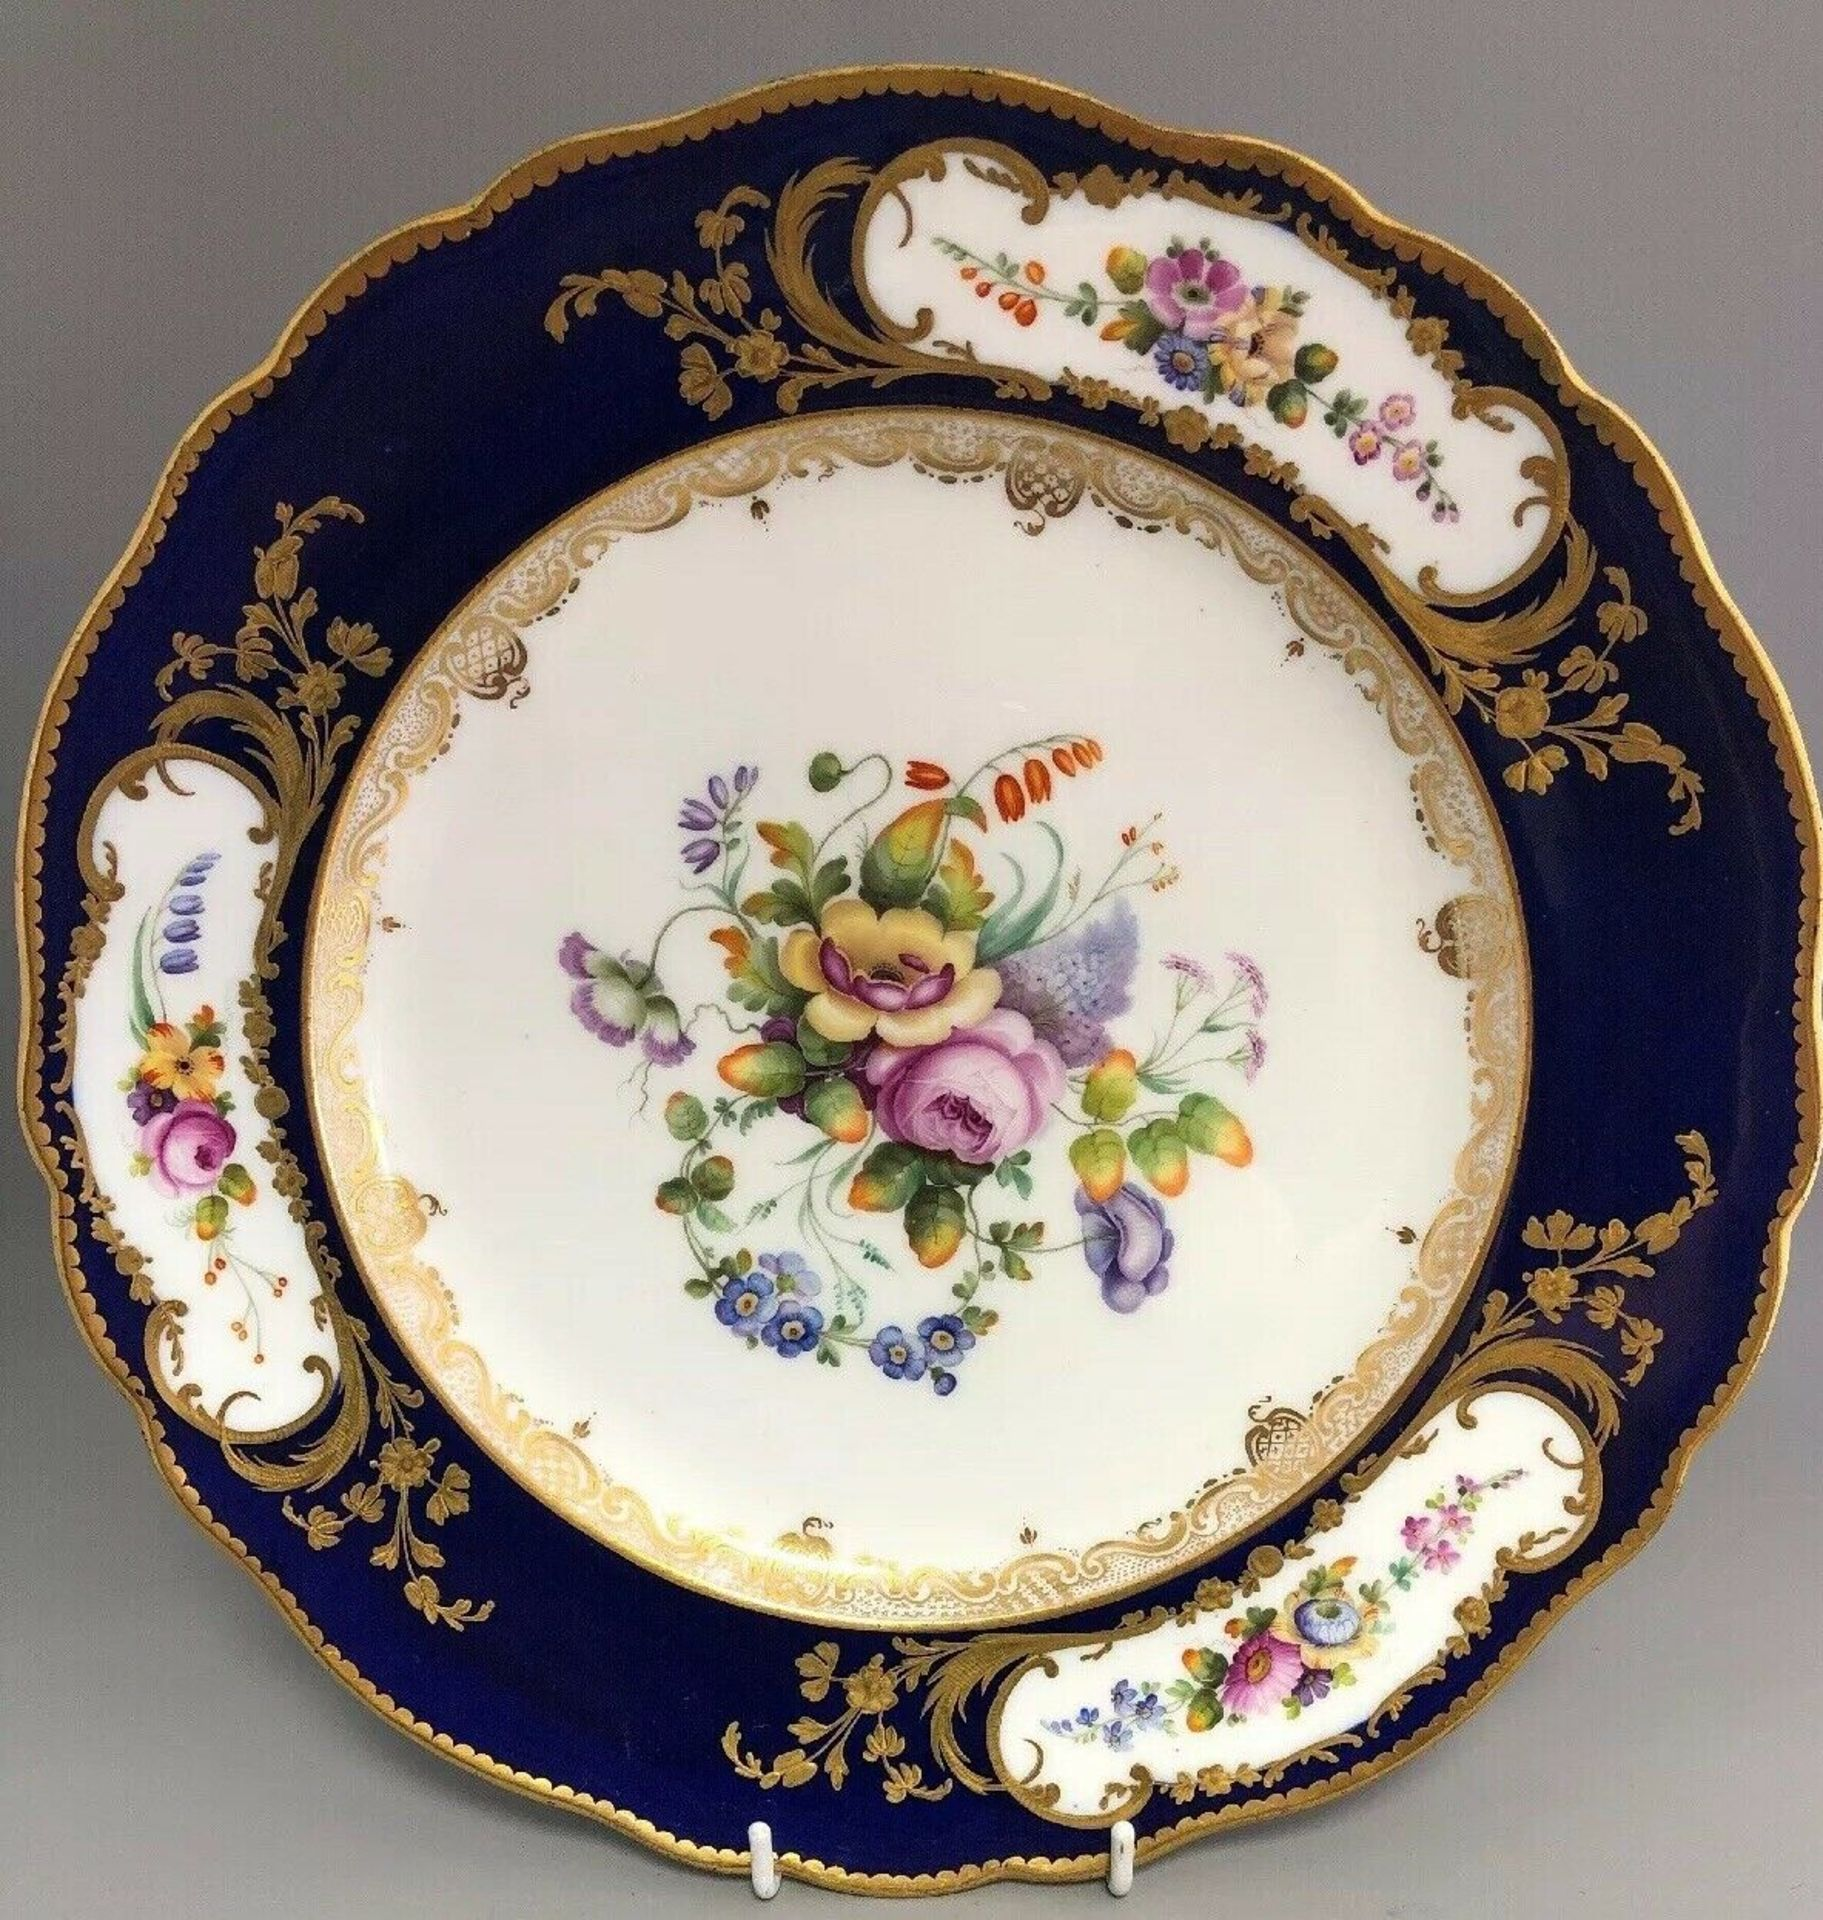 Lot 6 - Antique Coalport Porcelain Cabinet Plate Sparks Worcester Queen Adelaide C 1845